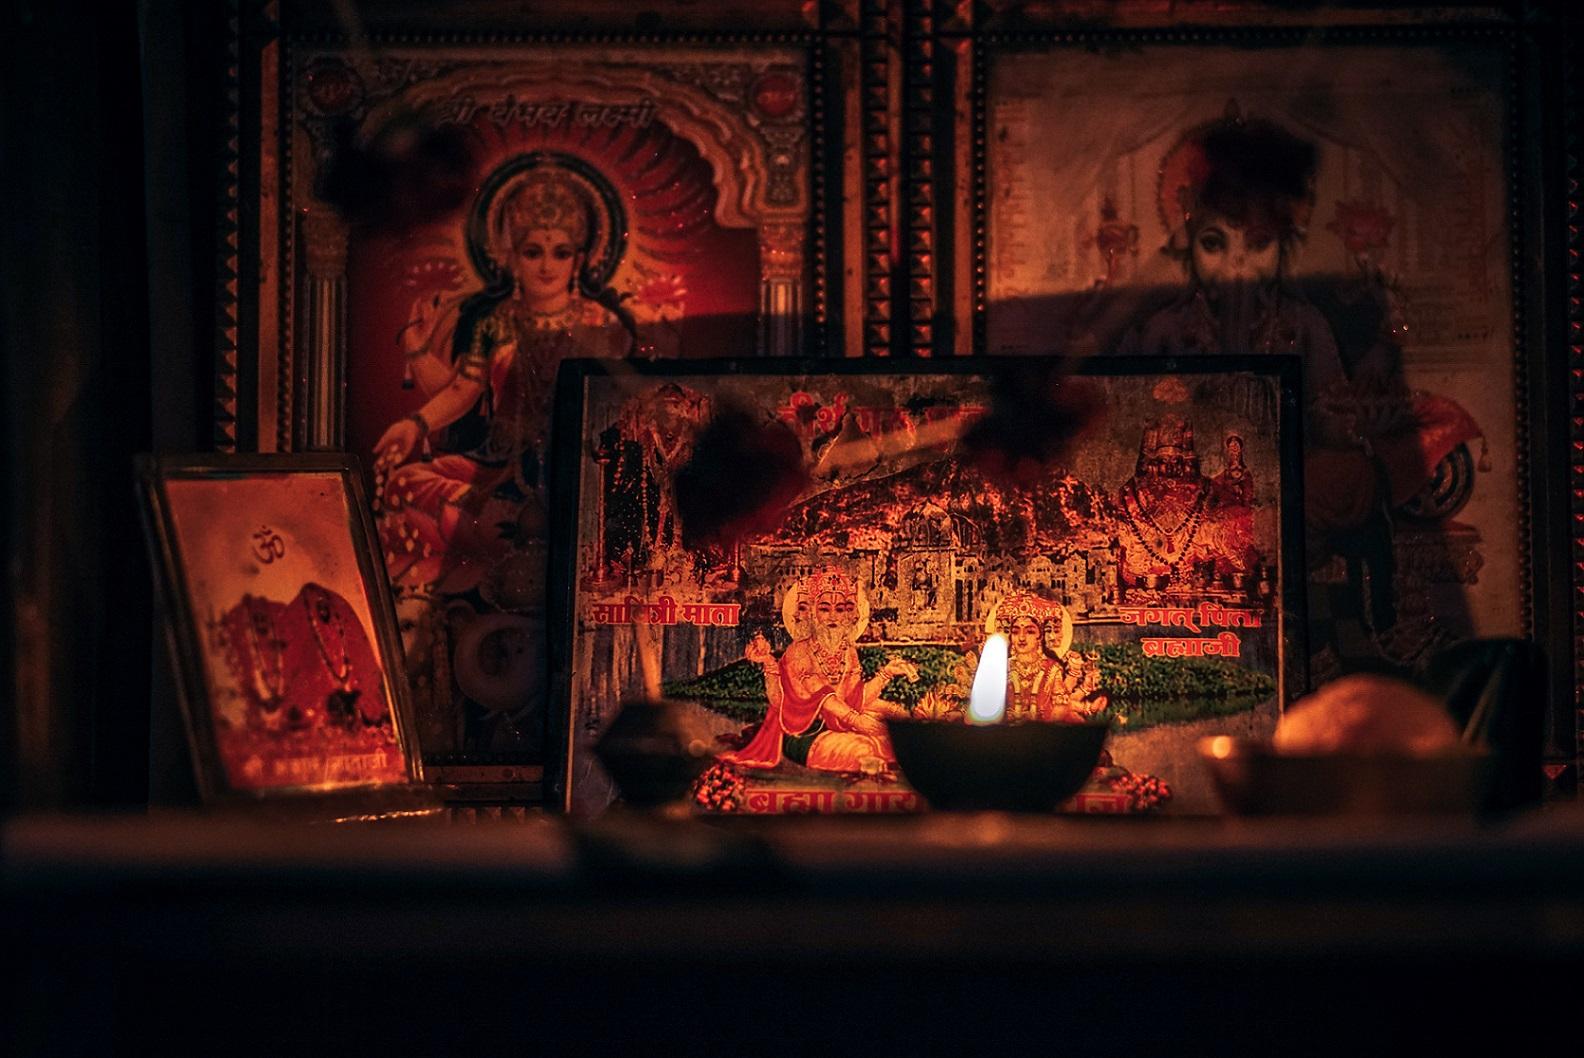 Mahabharat 1.3 – The Different Kinds of Mahabharata Fans